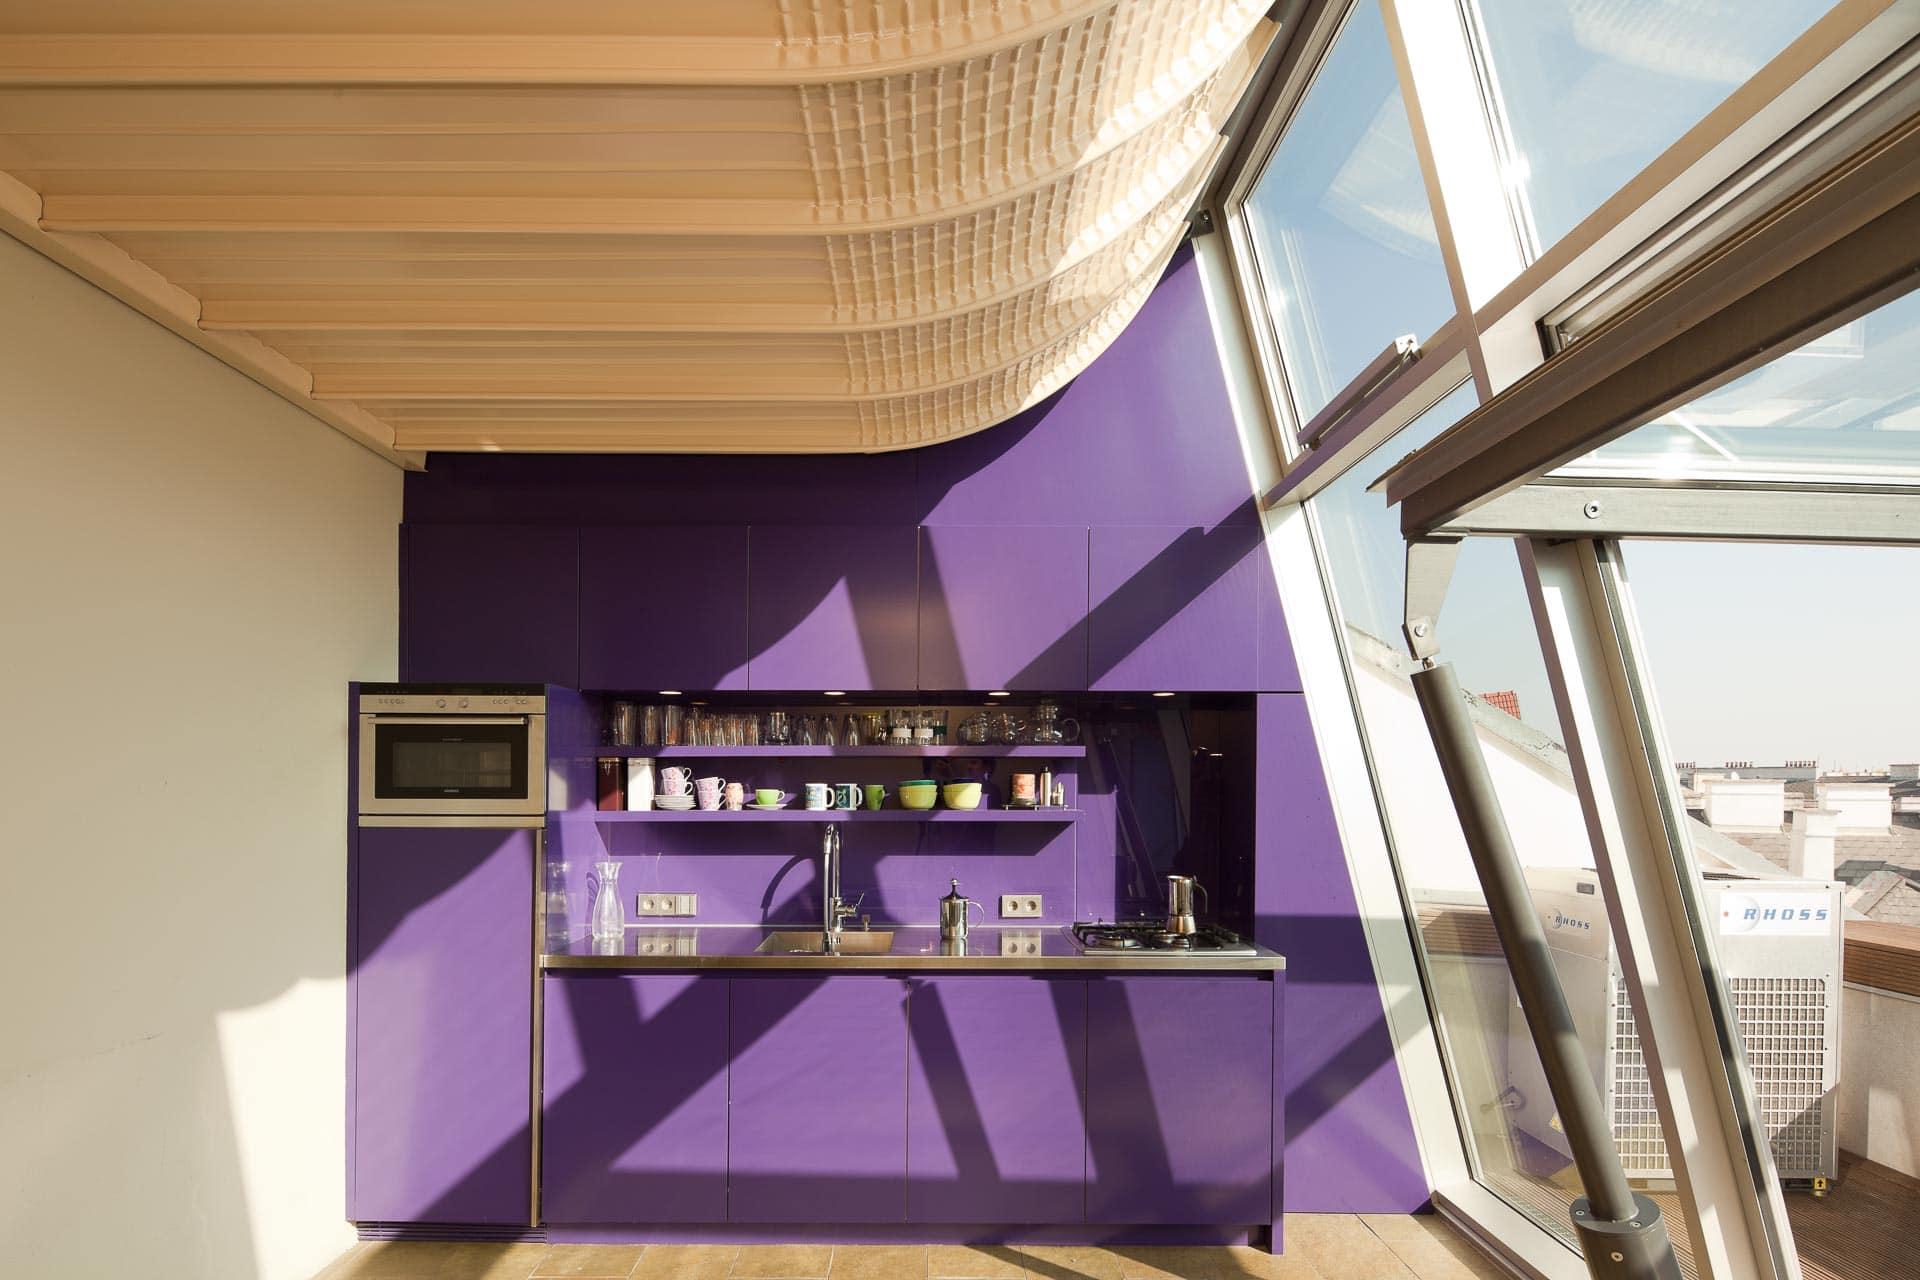 architekturfotograf wien mg 6081ba dirk wilhelmy fotografie stuttgart. Black Bedroom Furniture Sets. Home Design Ideas